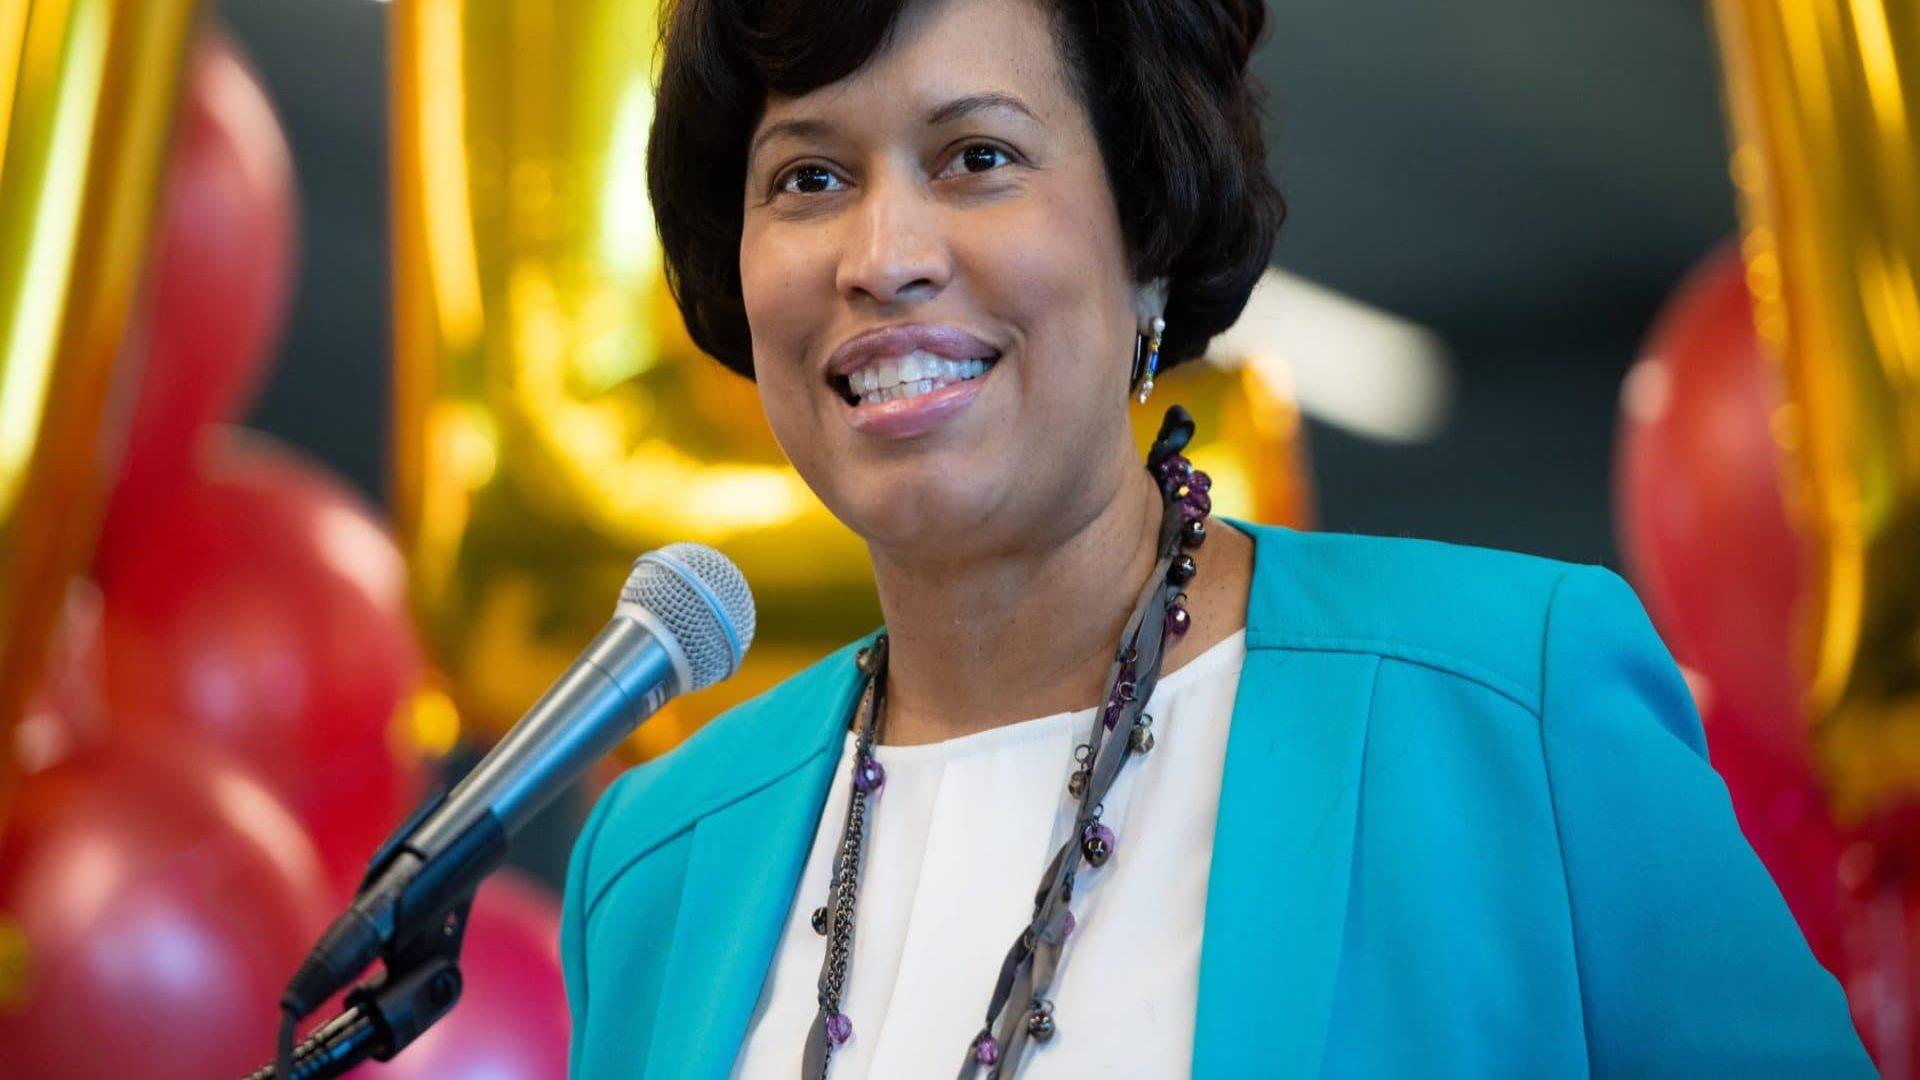 Mayor Muriel Bowser Wants D.C. Statehood, Prosperity For Residents